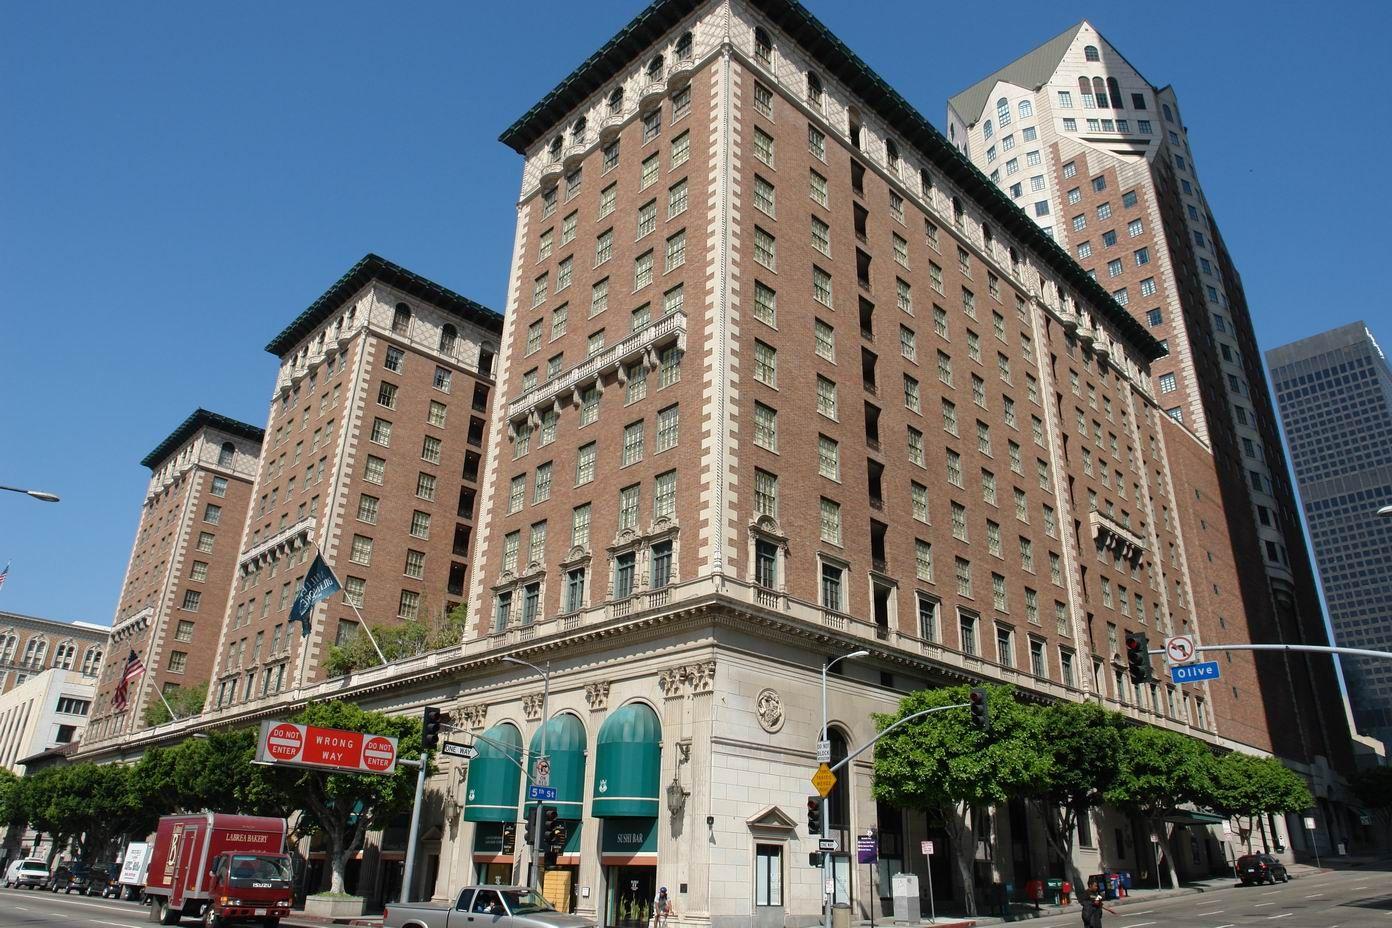 Biltmore Hotel Los Angeles